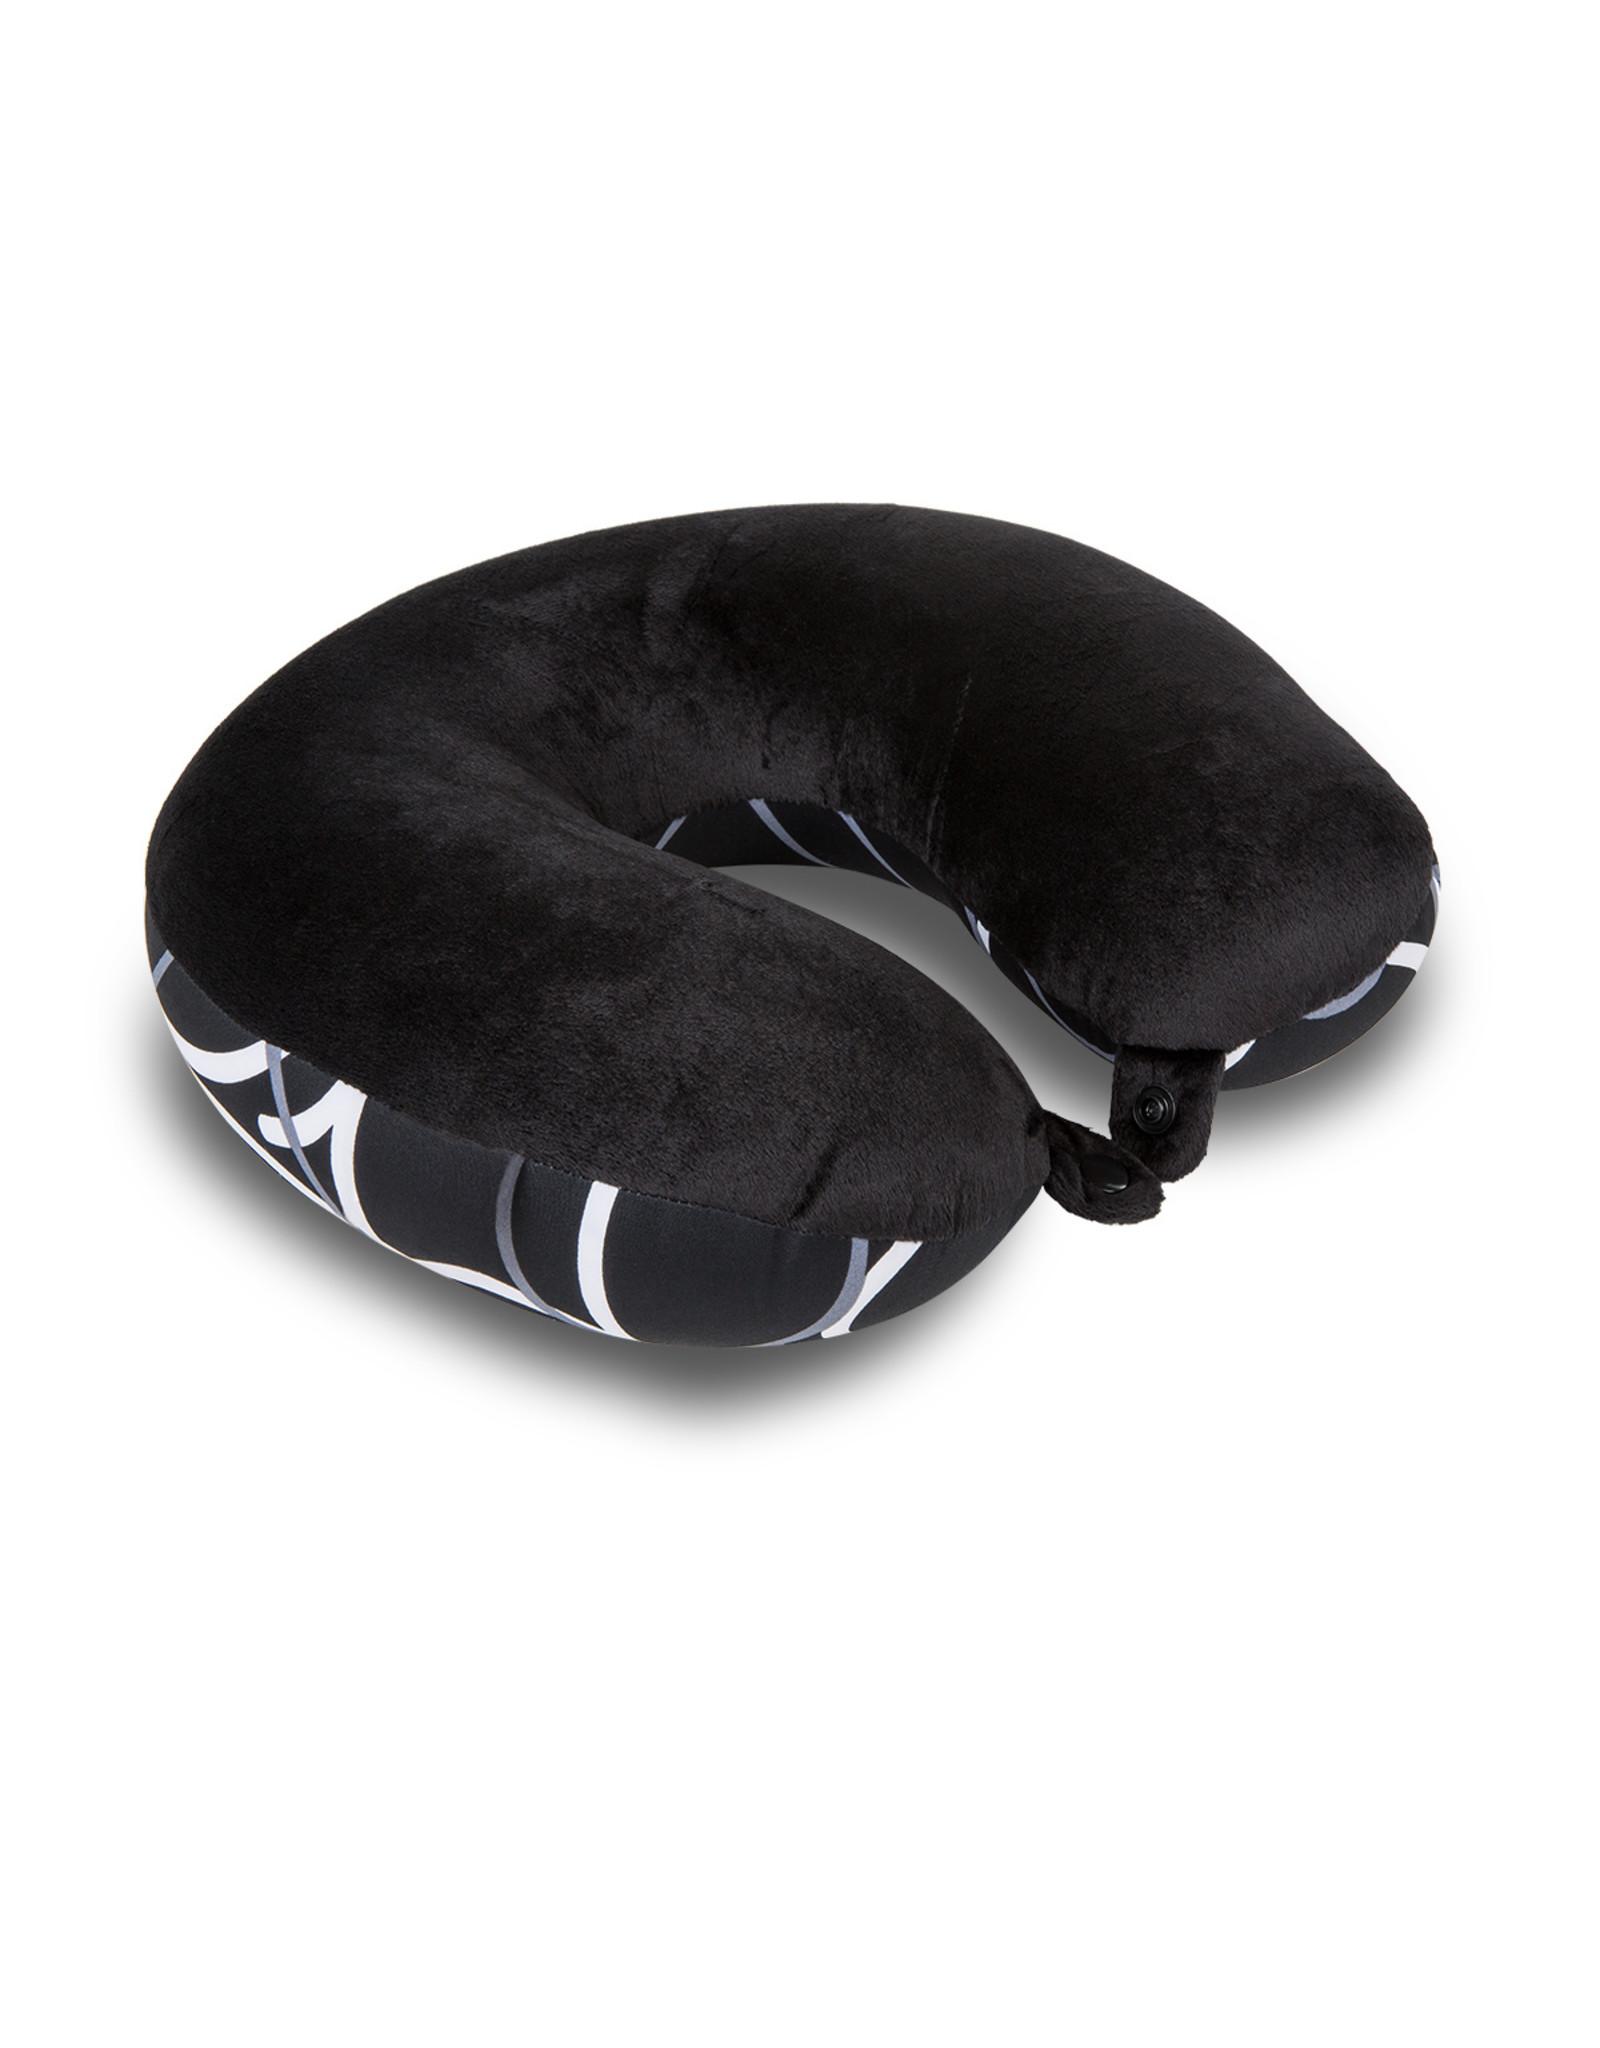 Kuschel-Maxx Kuschel-Maxx - Nack cushion Lines Black